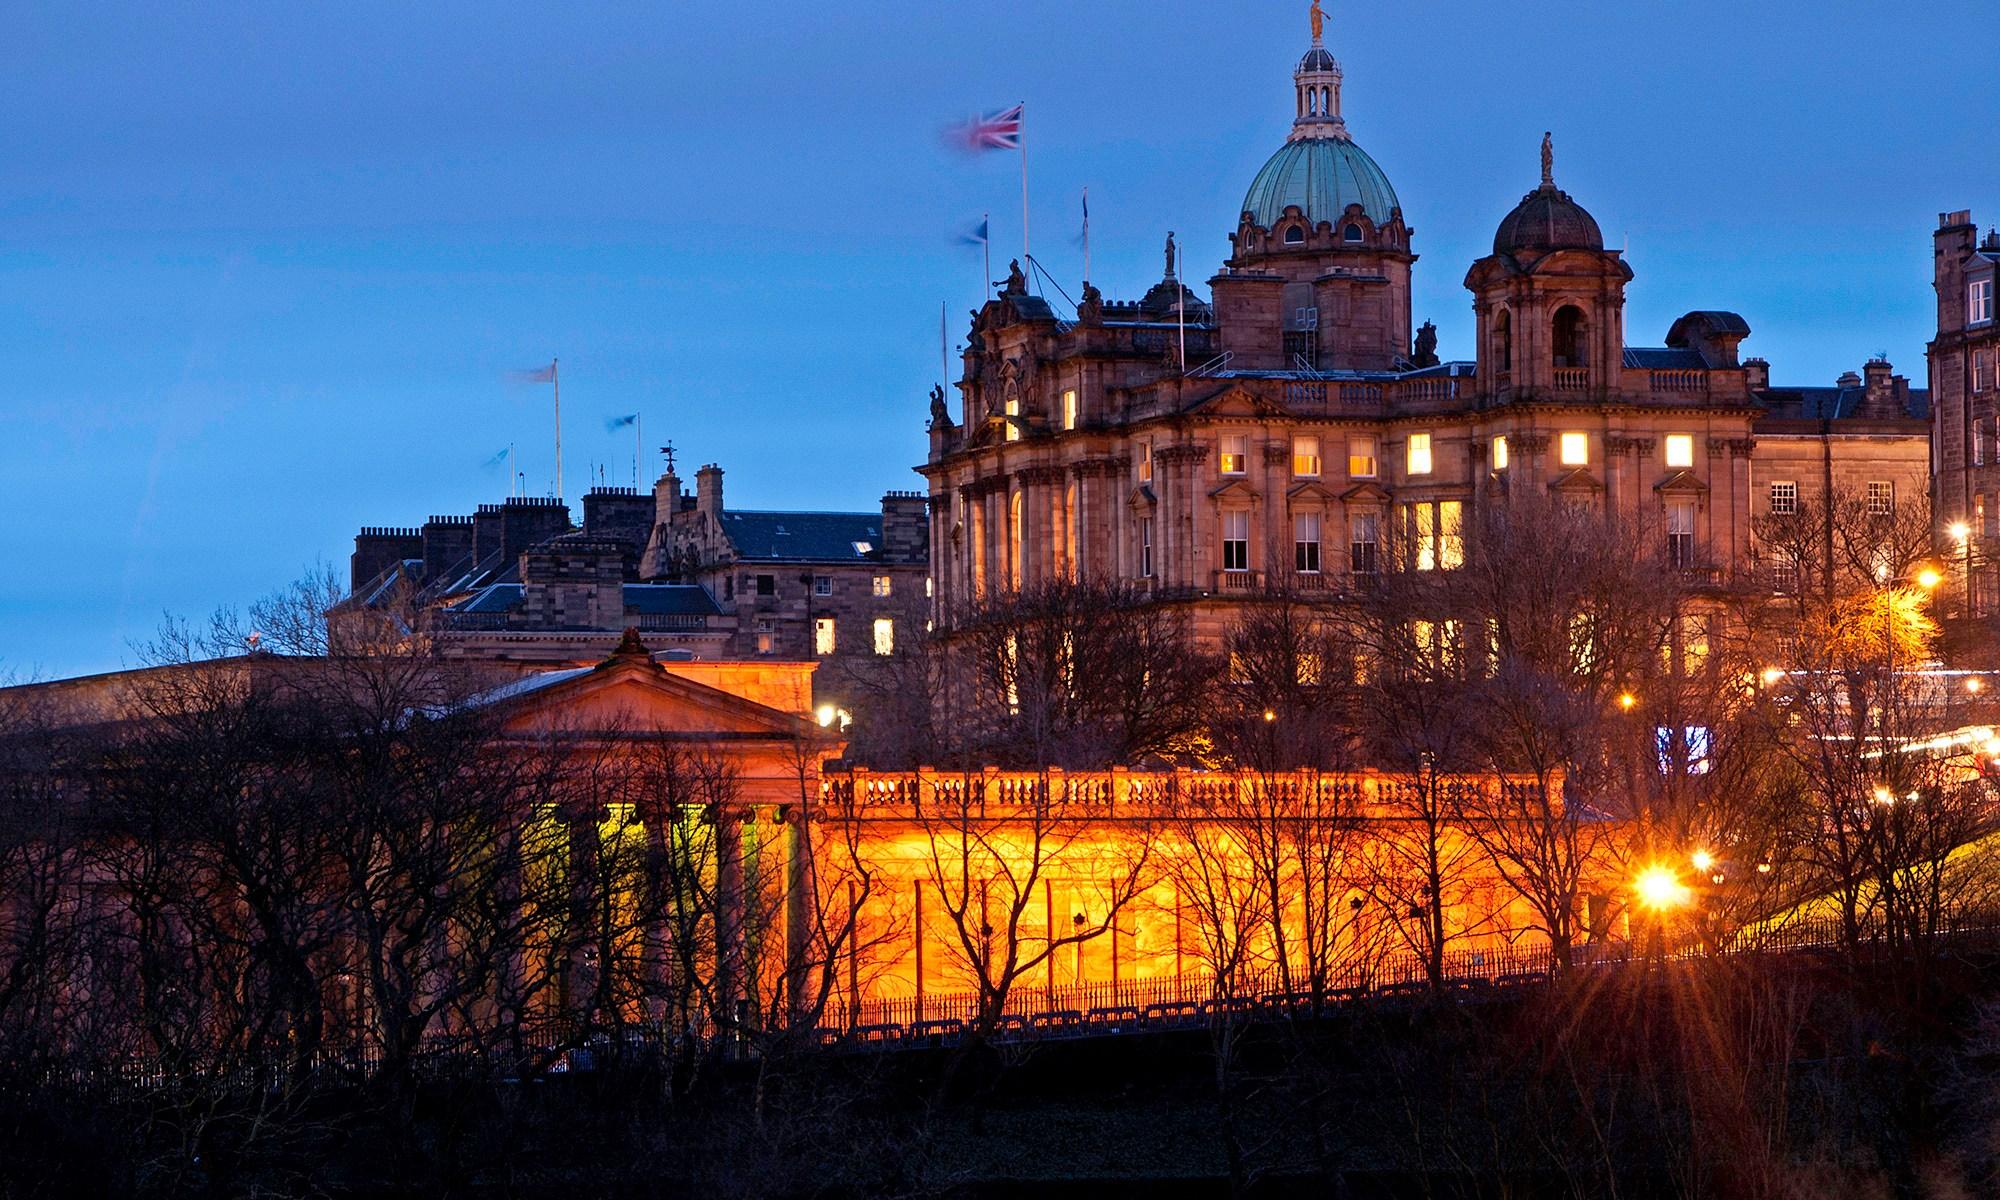 The Scotsman Hotel at Night, Edinburgh